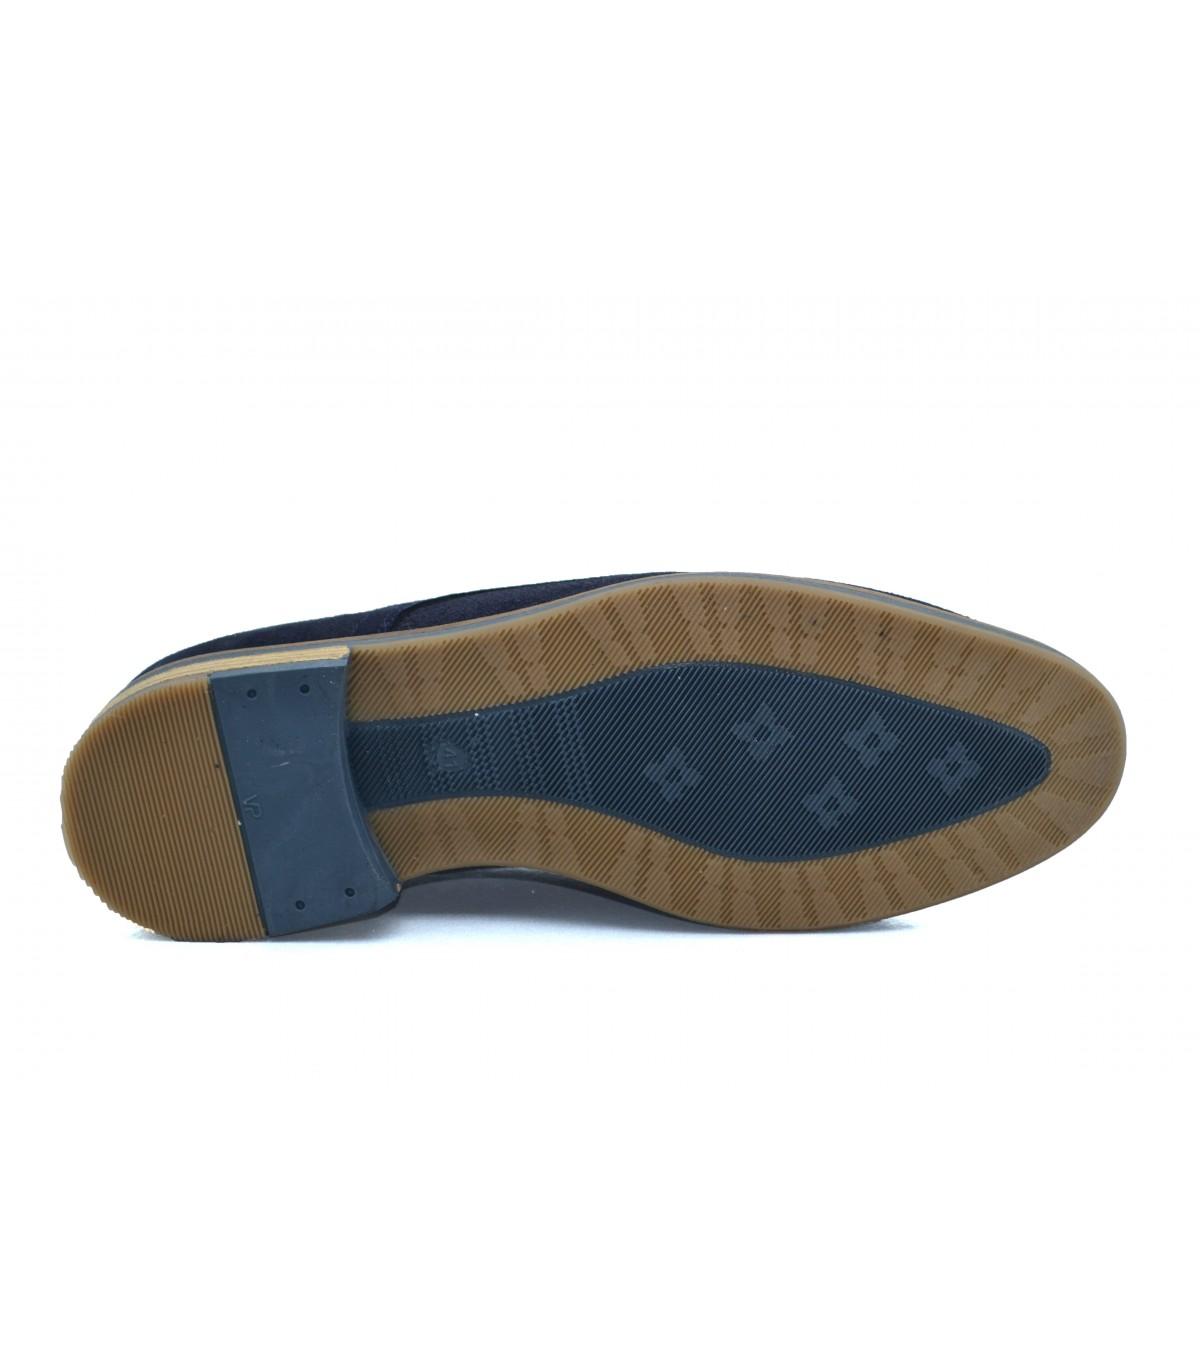 b3312b428 Zapatos cordones hombre BECOOL 7009